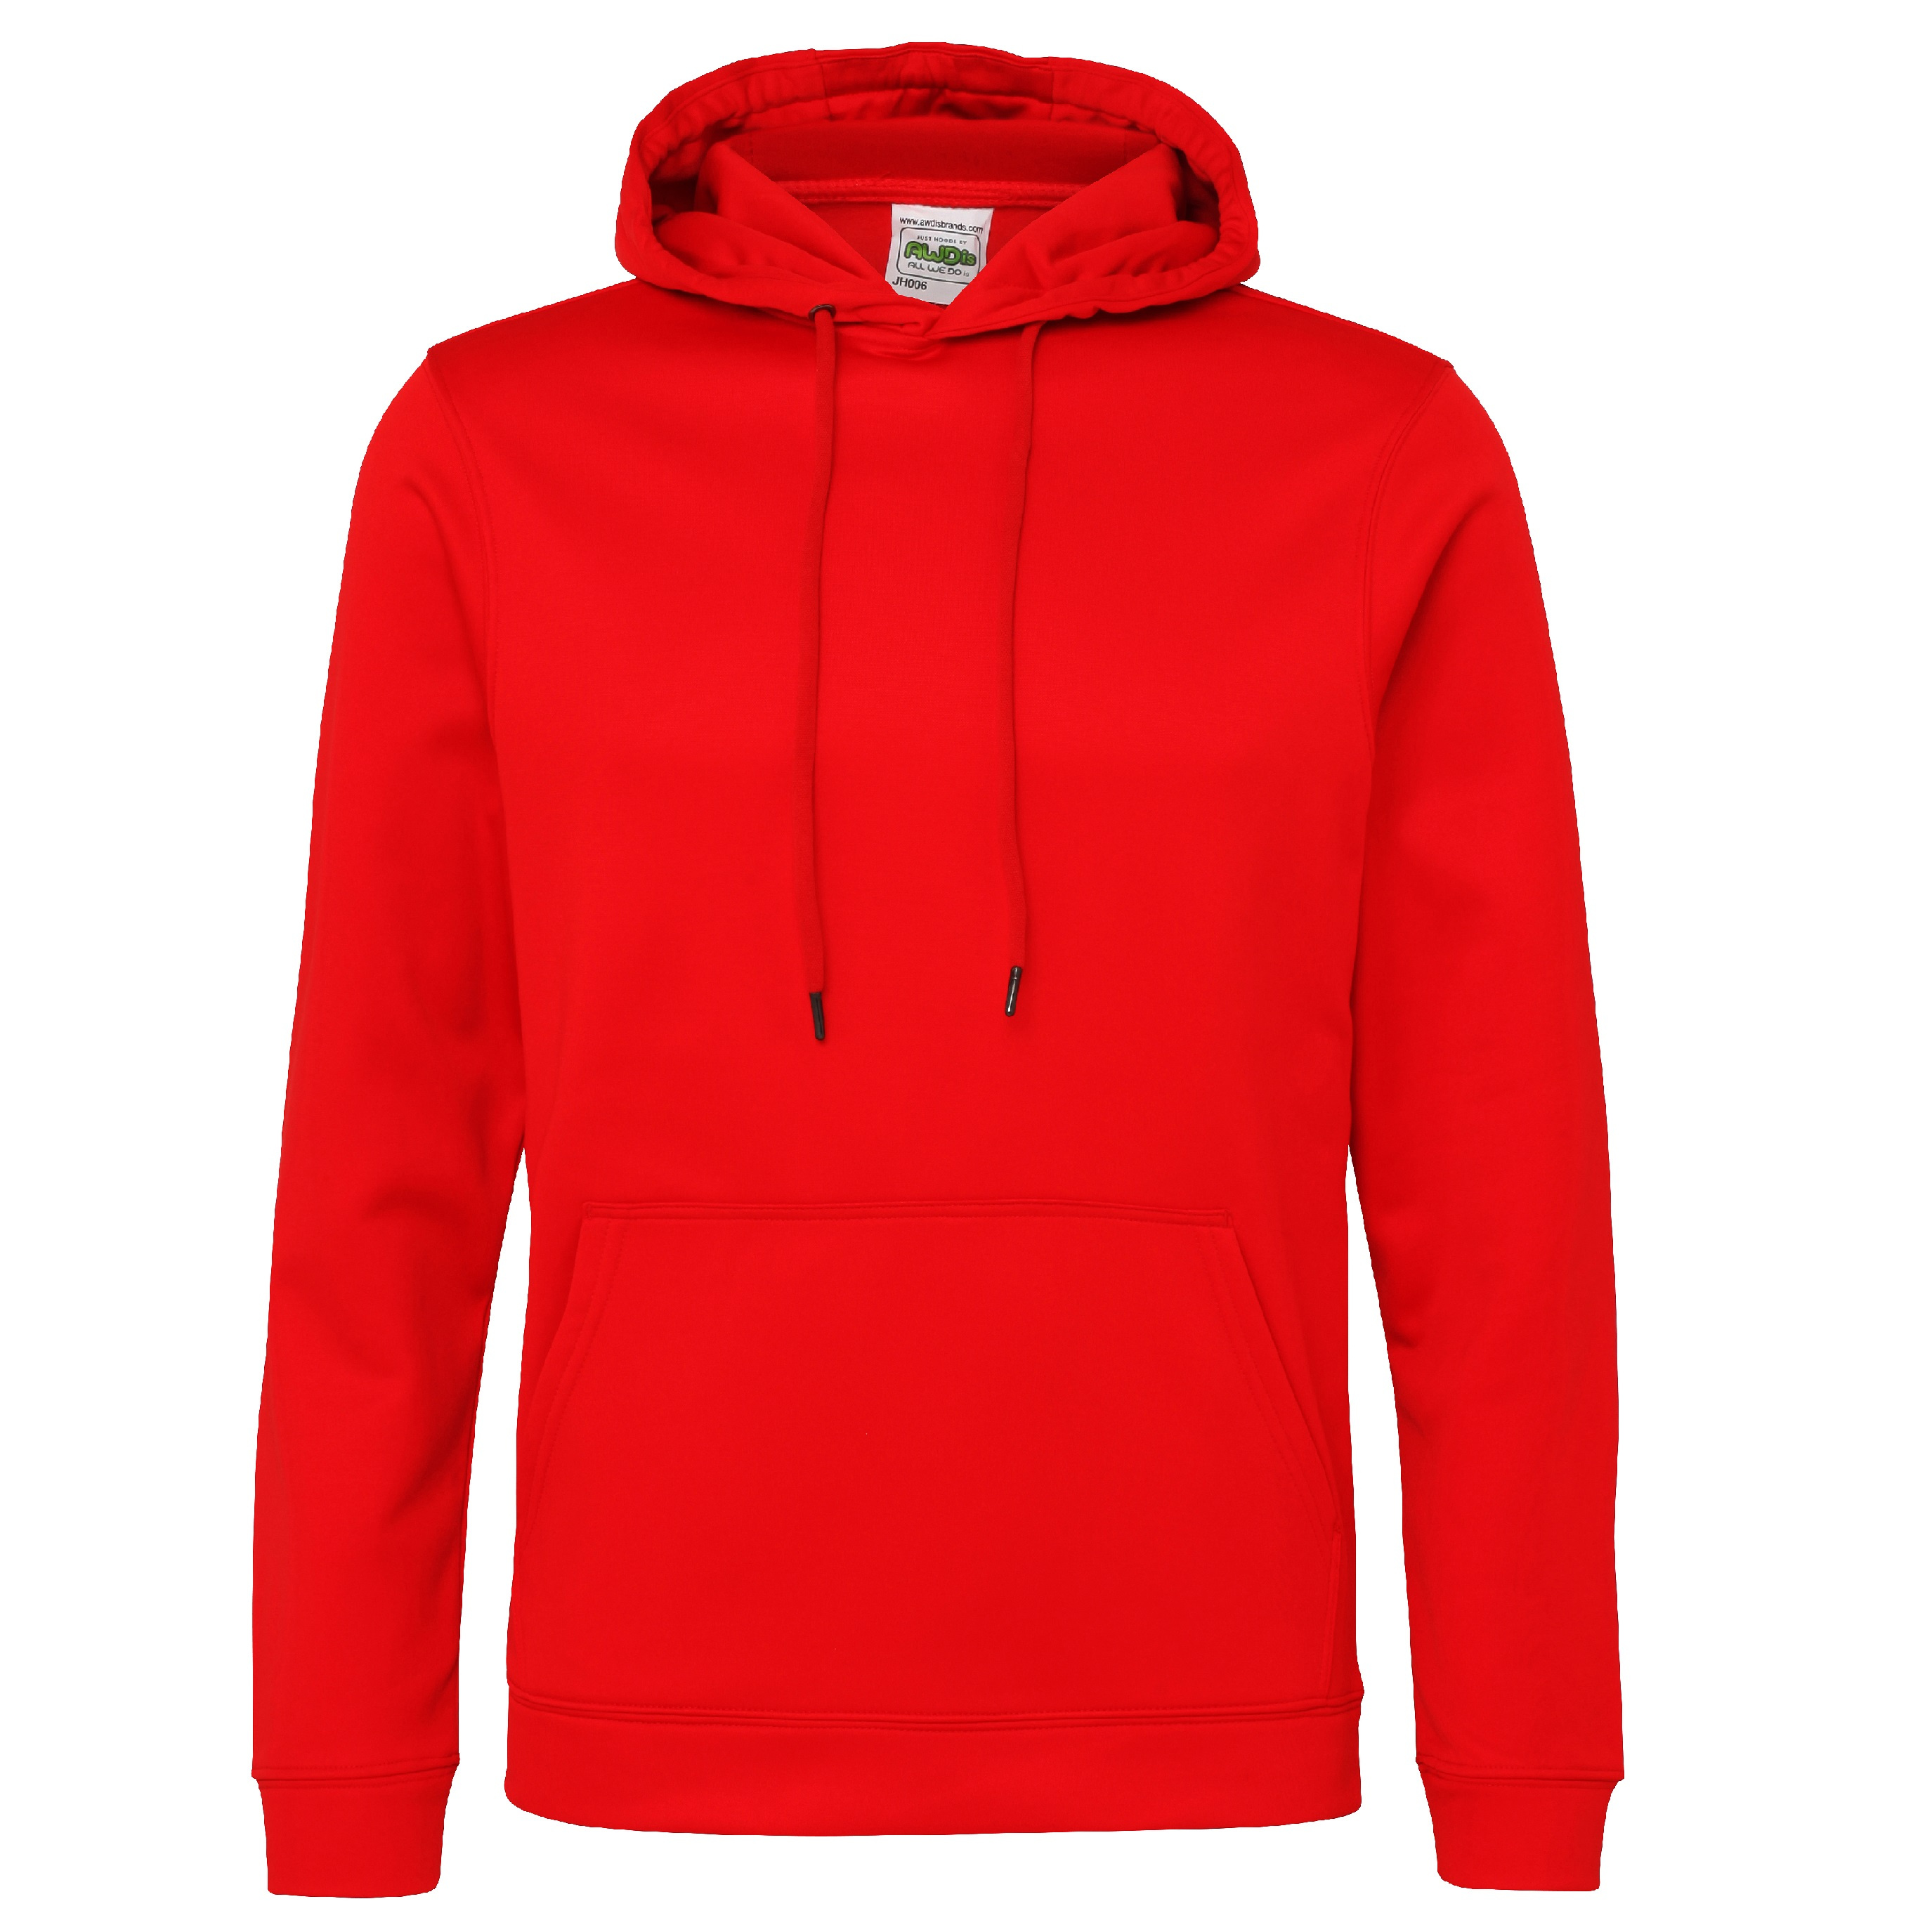 Polyester hoodies